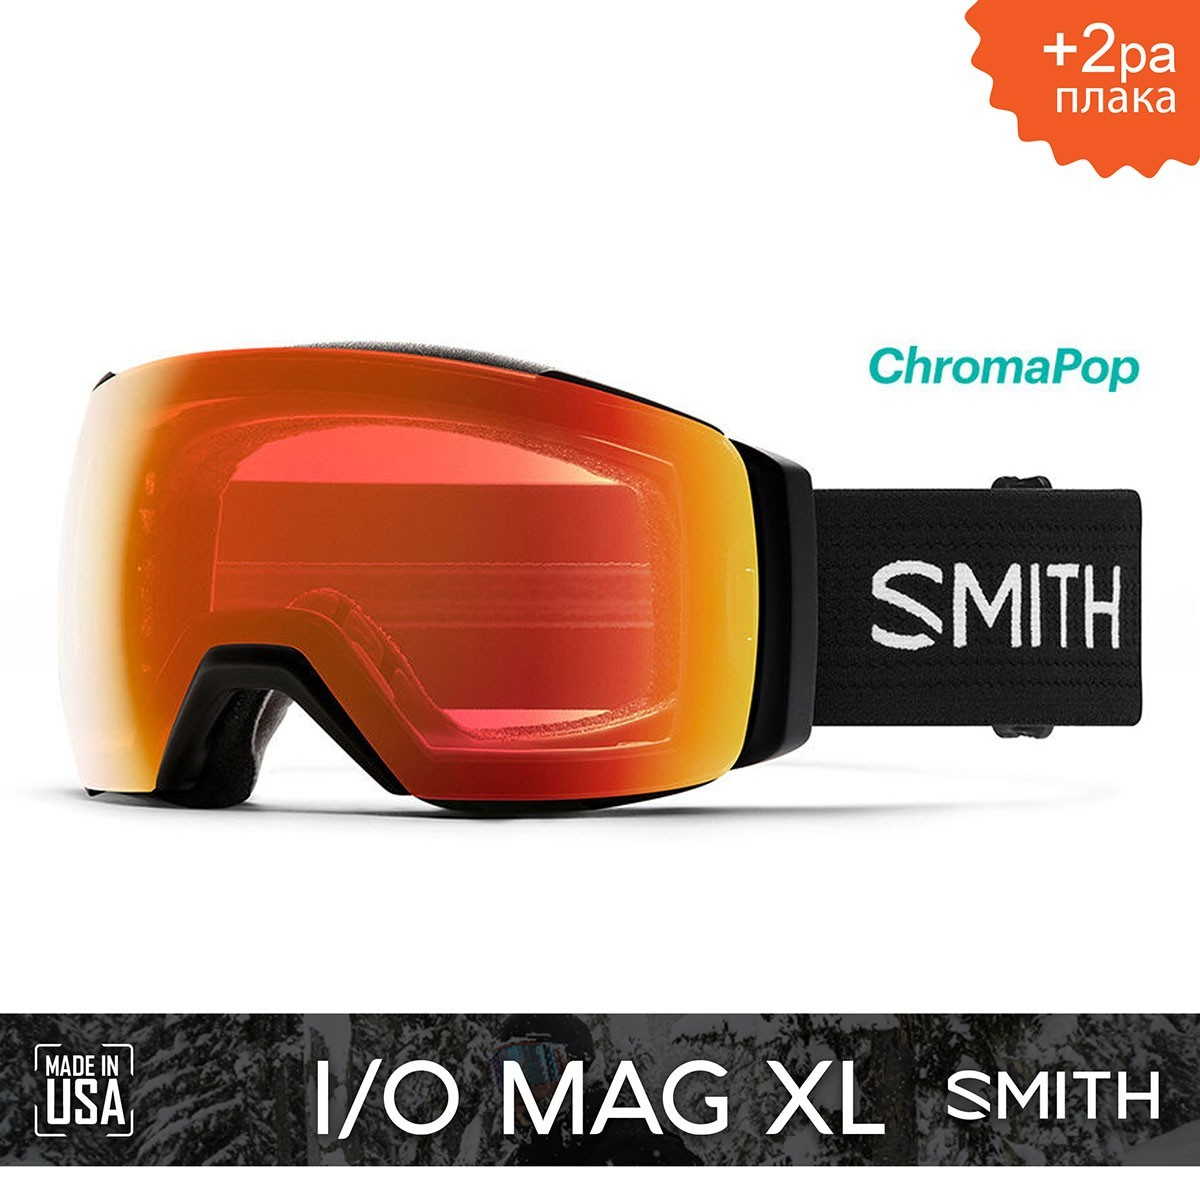 SMITH IO MAG XL black | S2 CHROMAPOP Everyday Red Mirror - Изображение - AQUAMATRIX